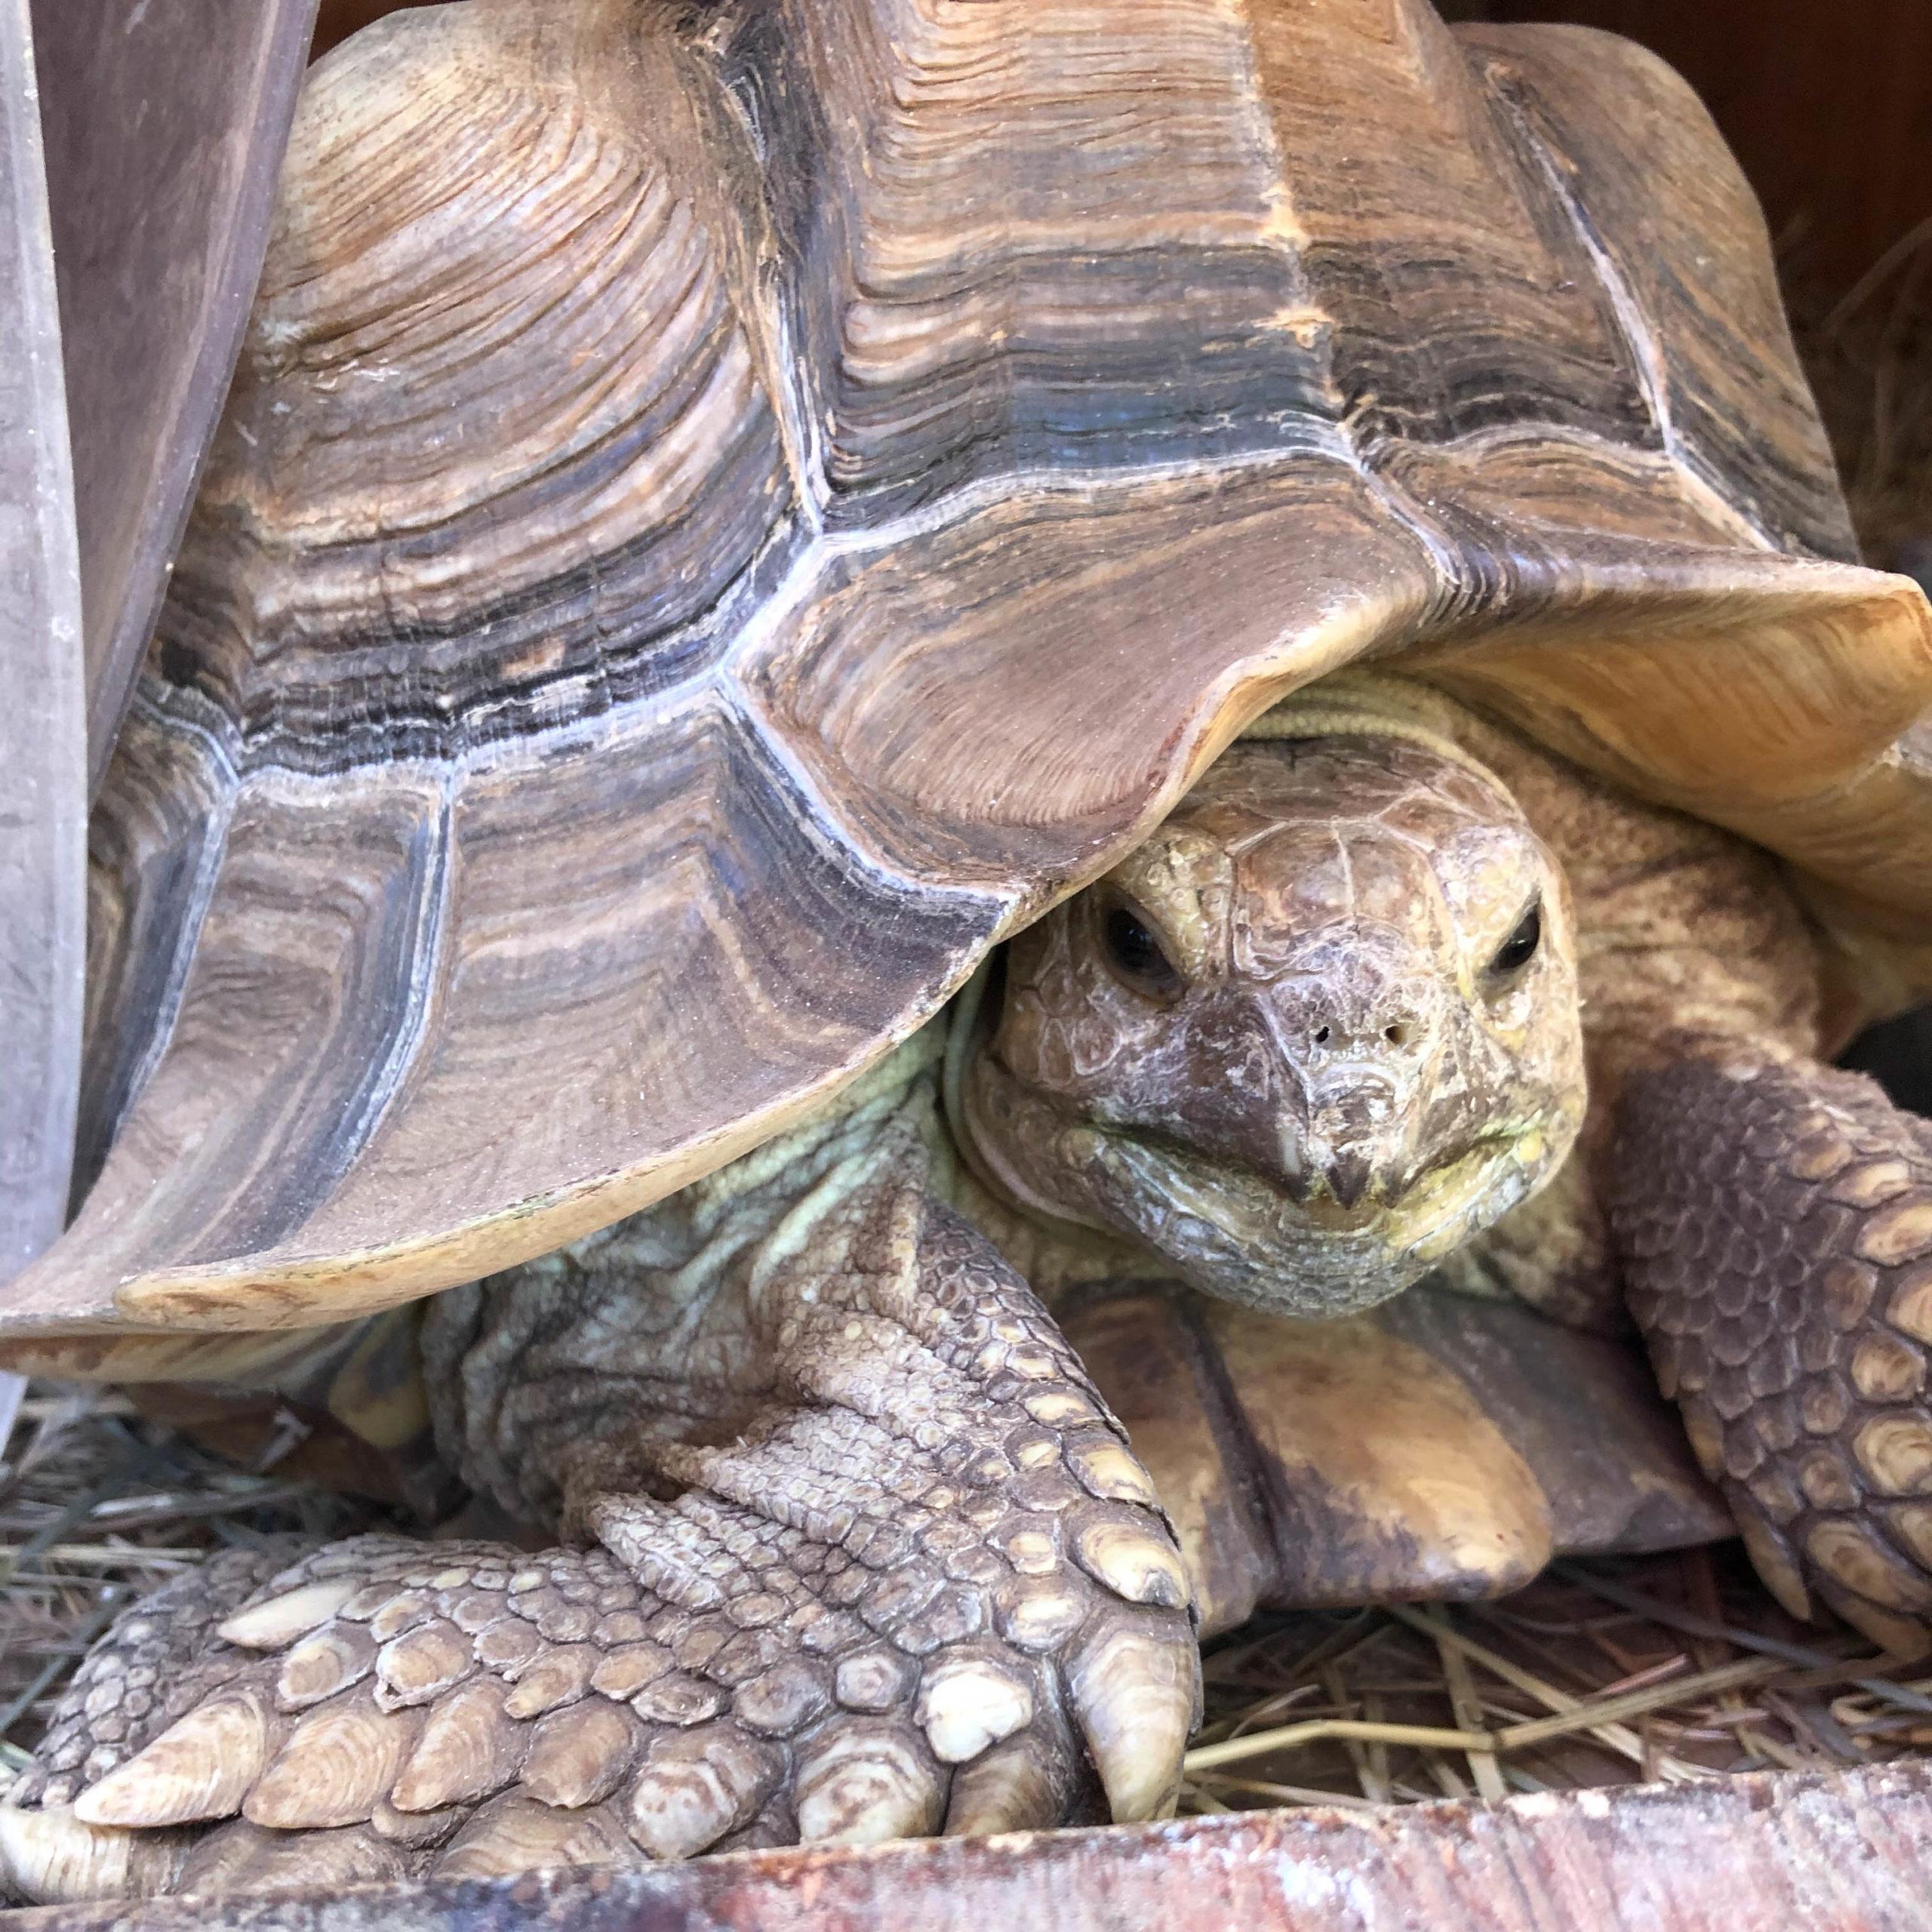 Princess Neferu - Sulcata Tortoise (Centrochelys sulcata)